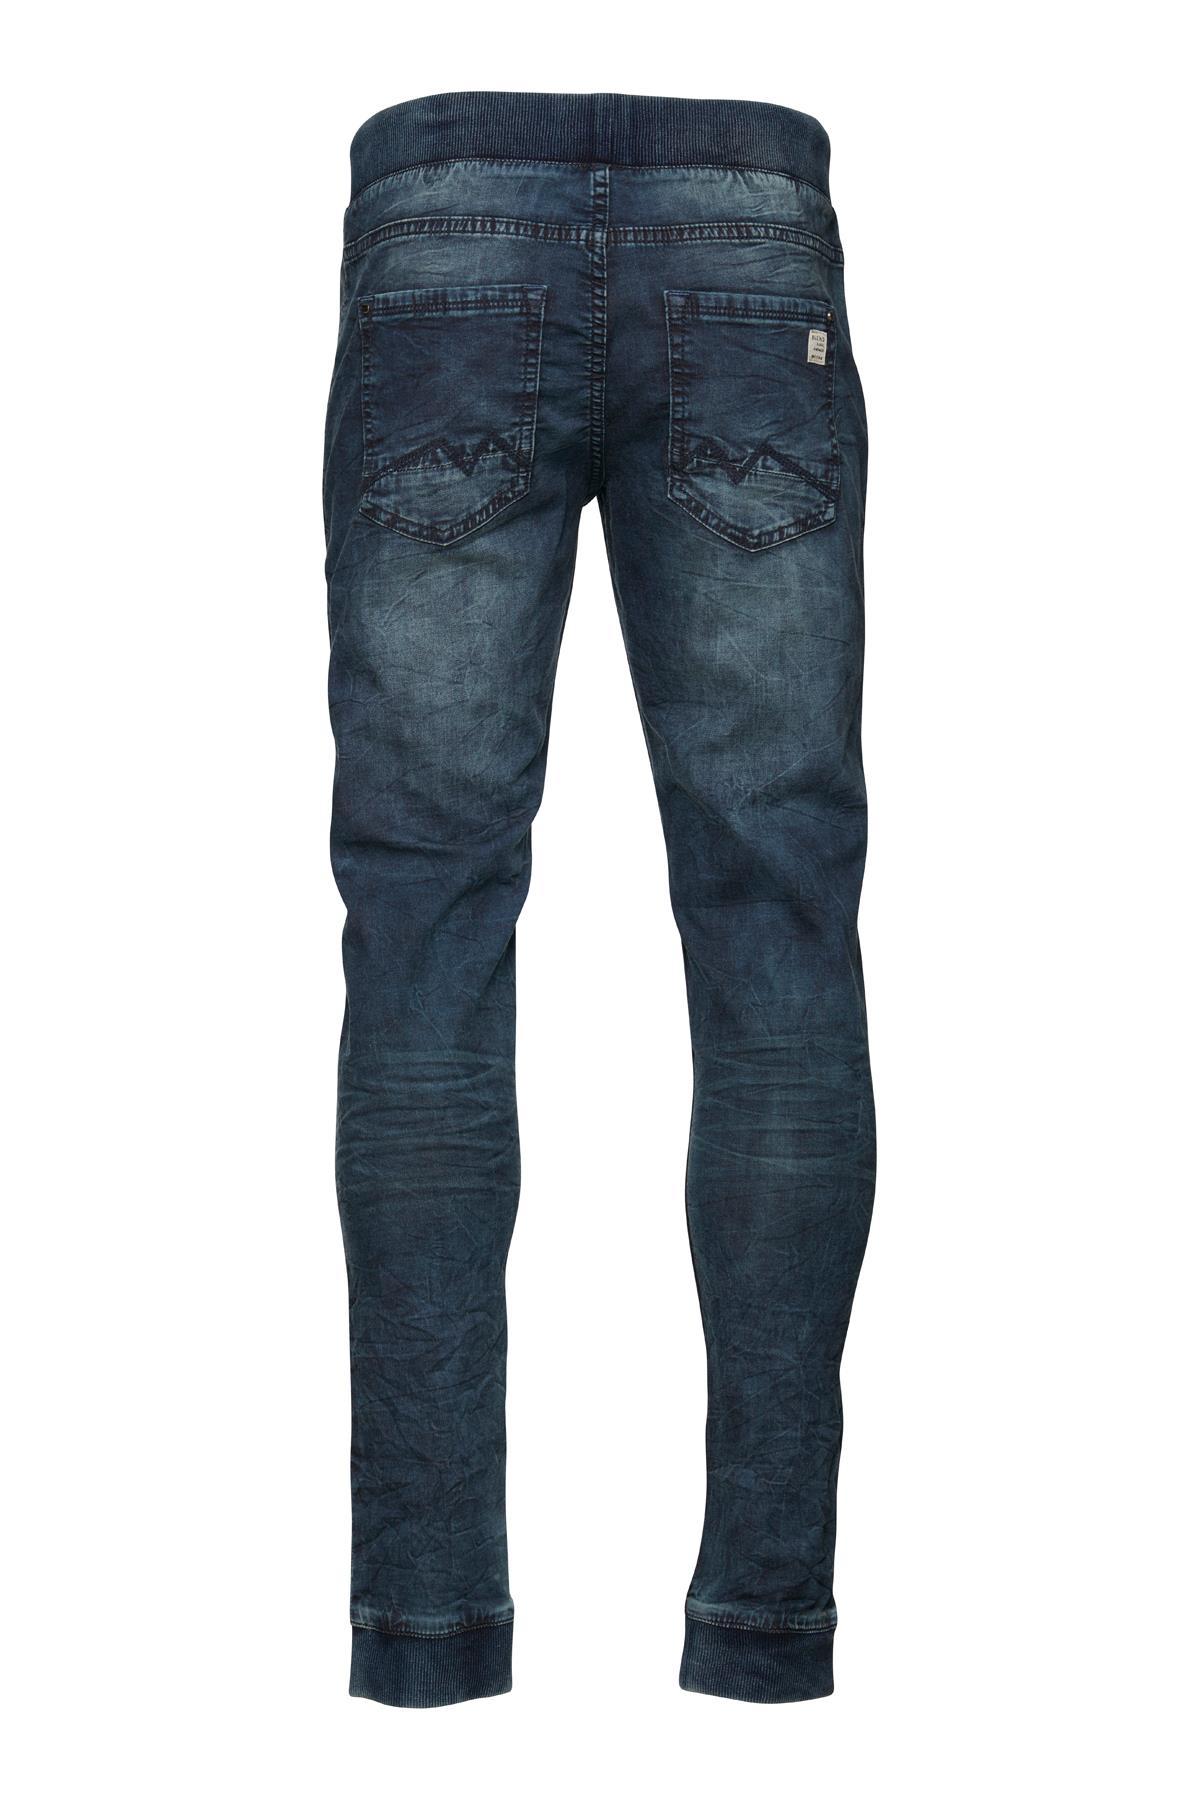 Blizzard jeans fra Blend He – Køb  Blizzard jeans fra str. S-XXL her